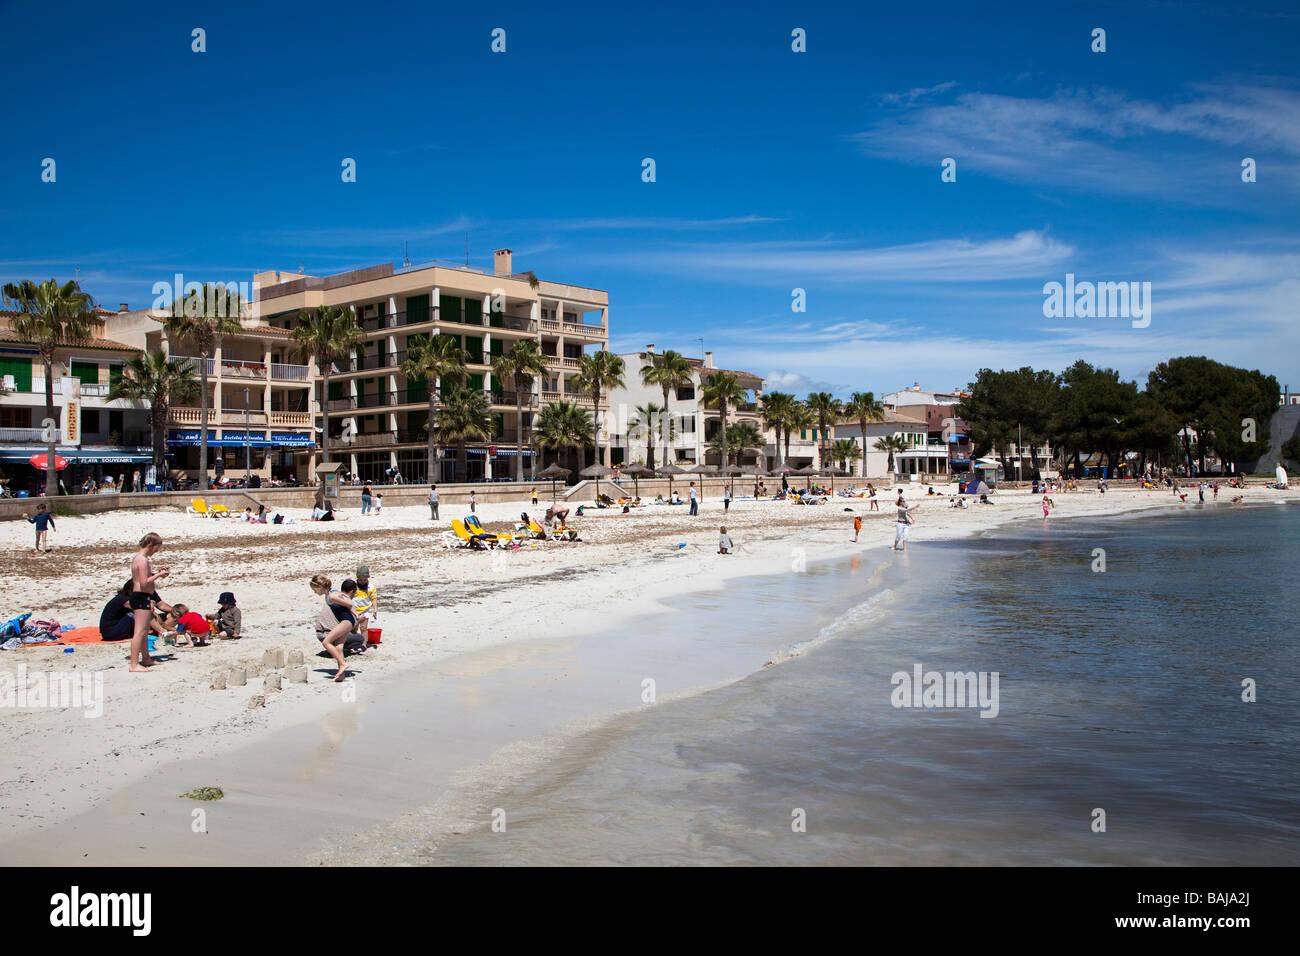 Children playing on beach Colonia de Sant Jordi Mallorca Spain - Stock Image